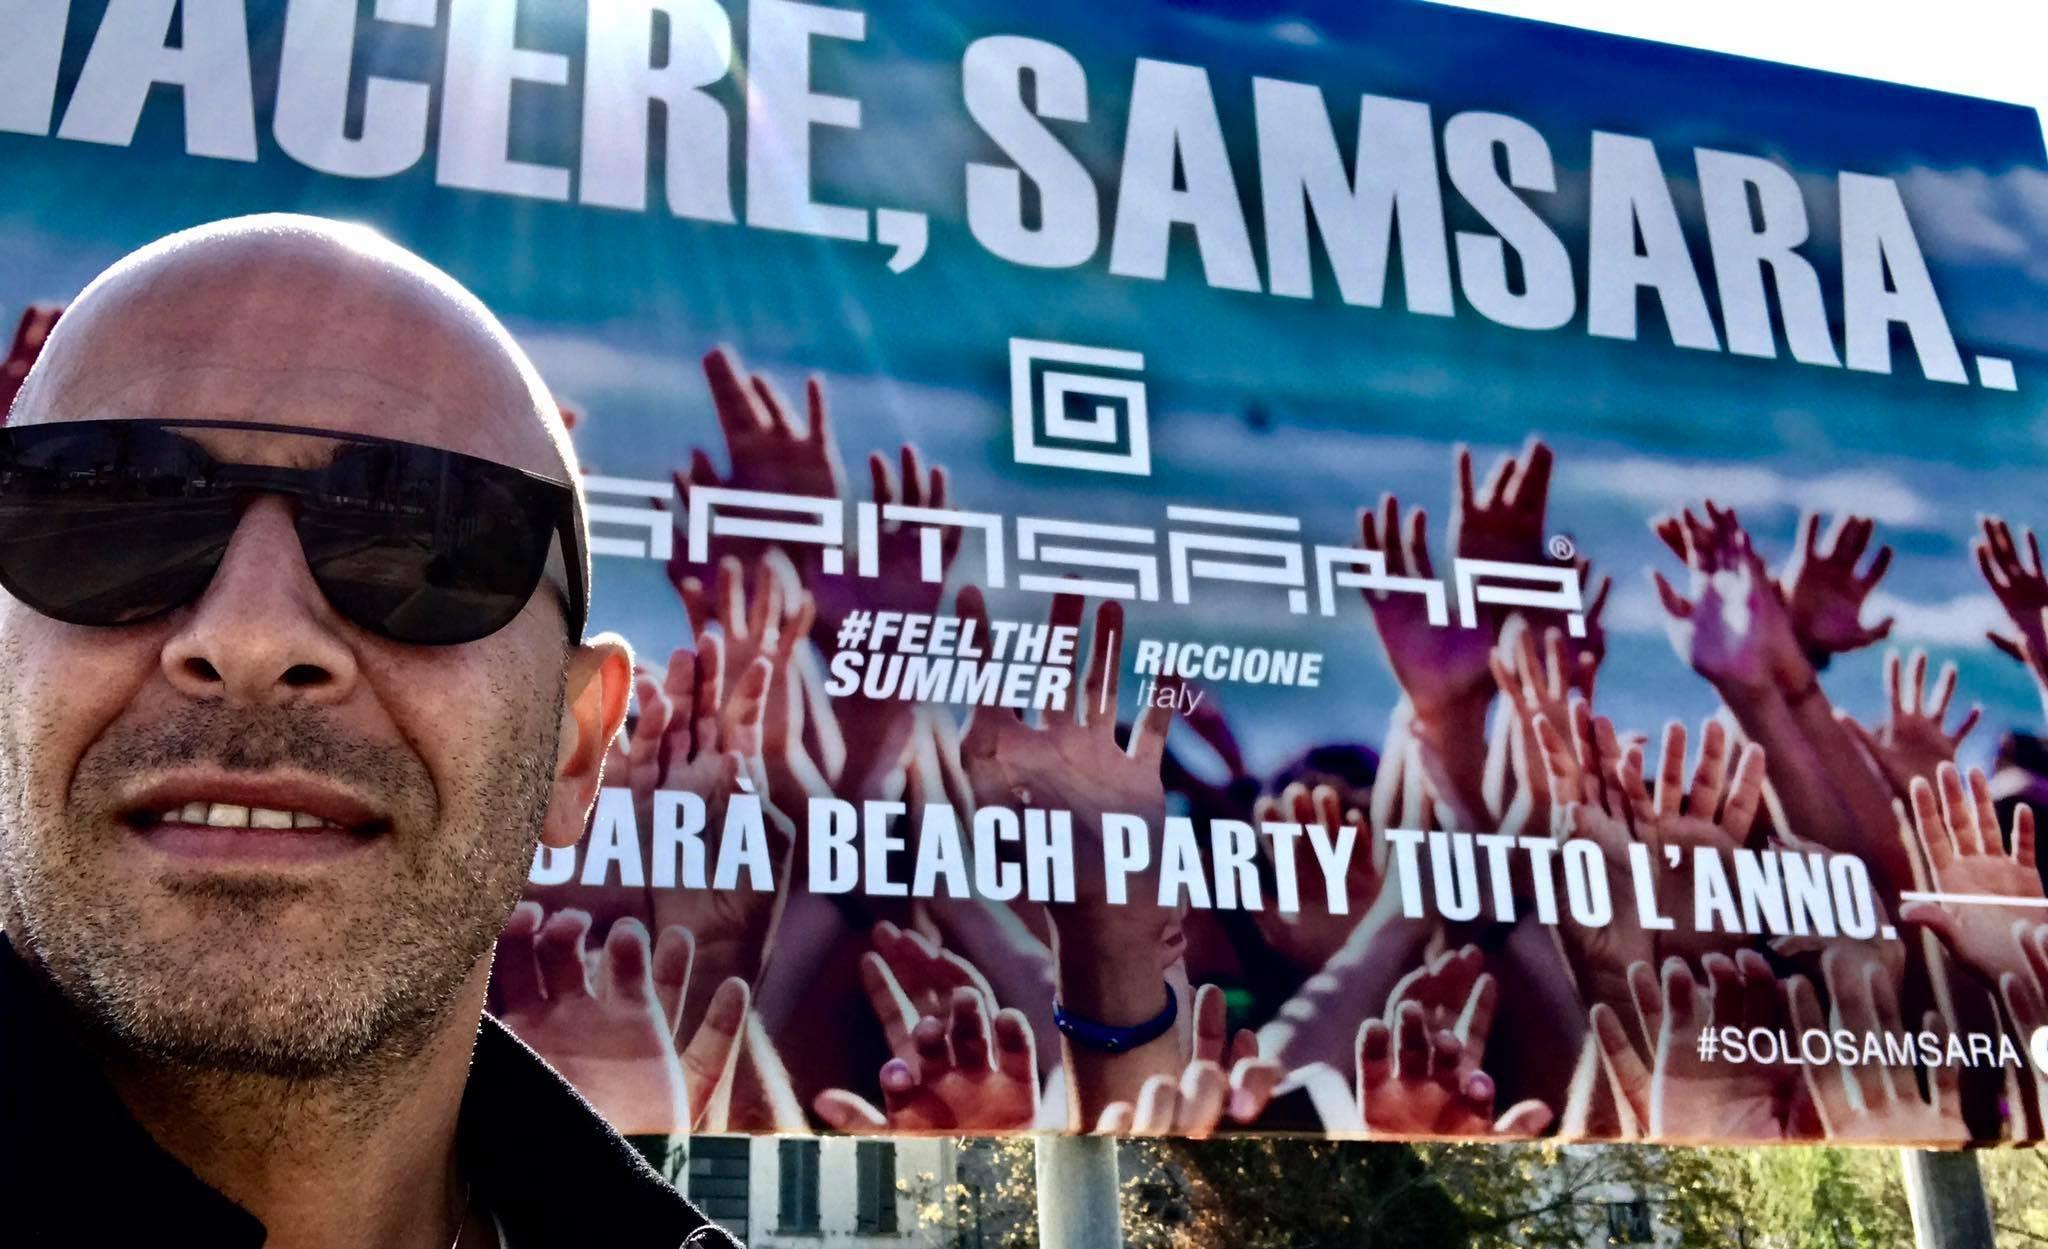 David Cicchella Samsara Beach